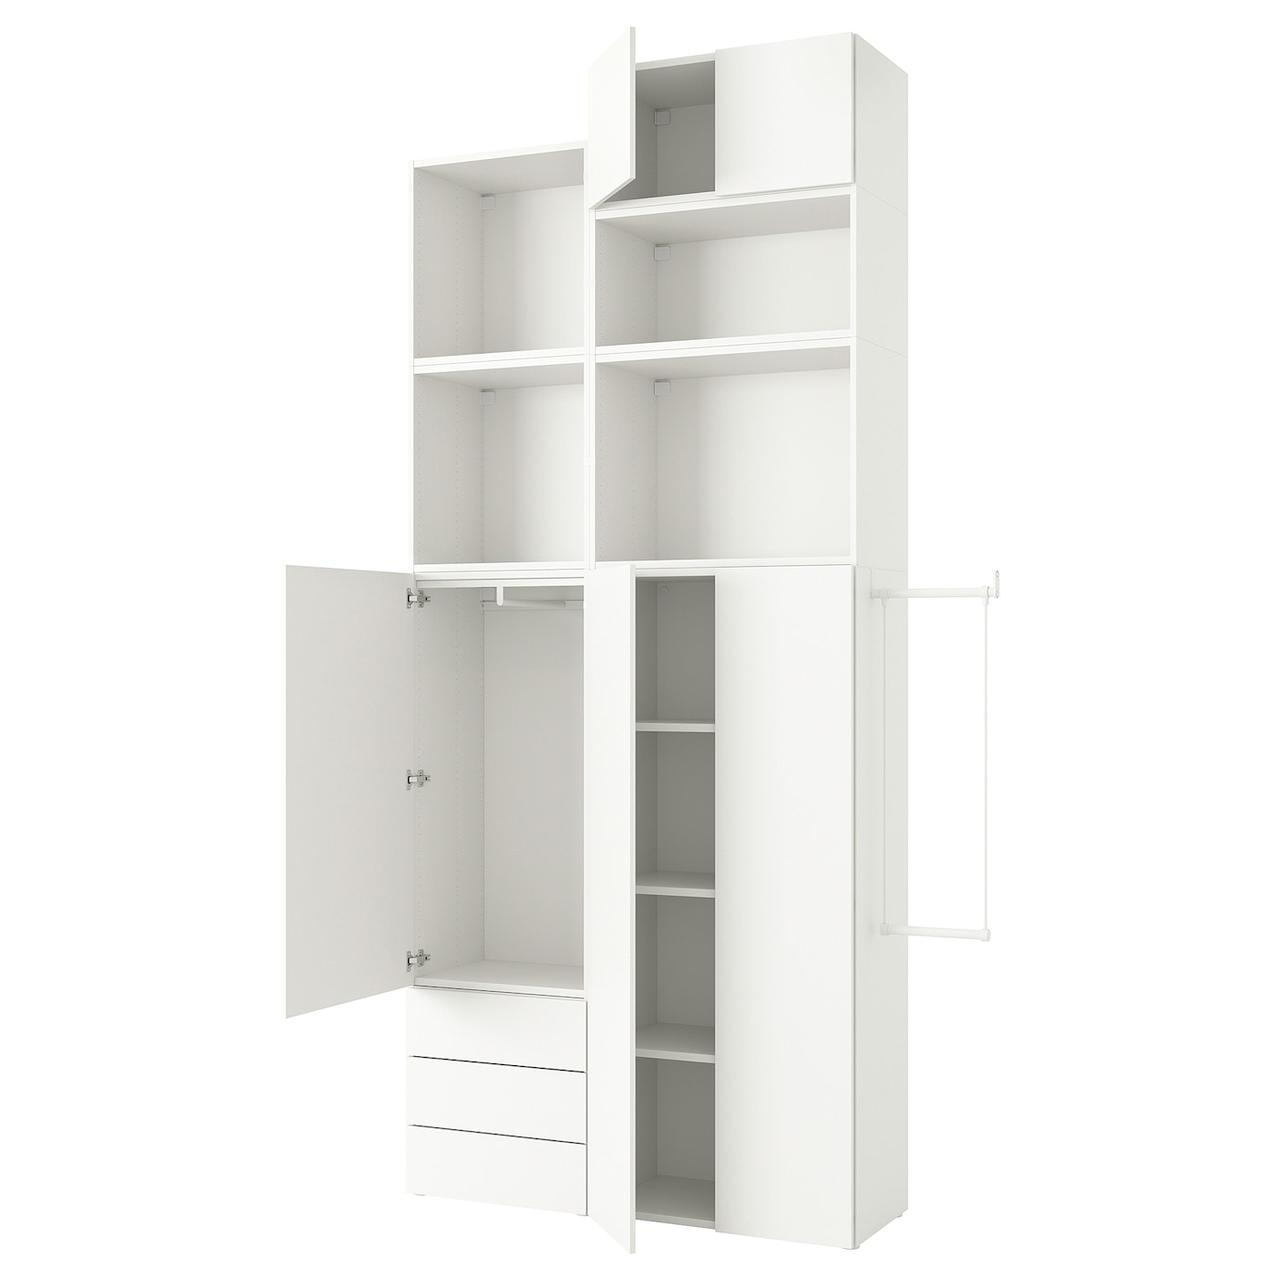 IKEA PLATSA Шкаф 5 дверей 3 ящика/Fonnes белый 175-205x42x321 см